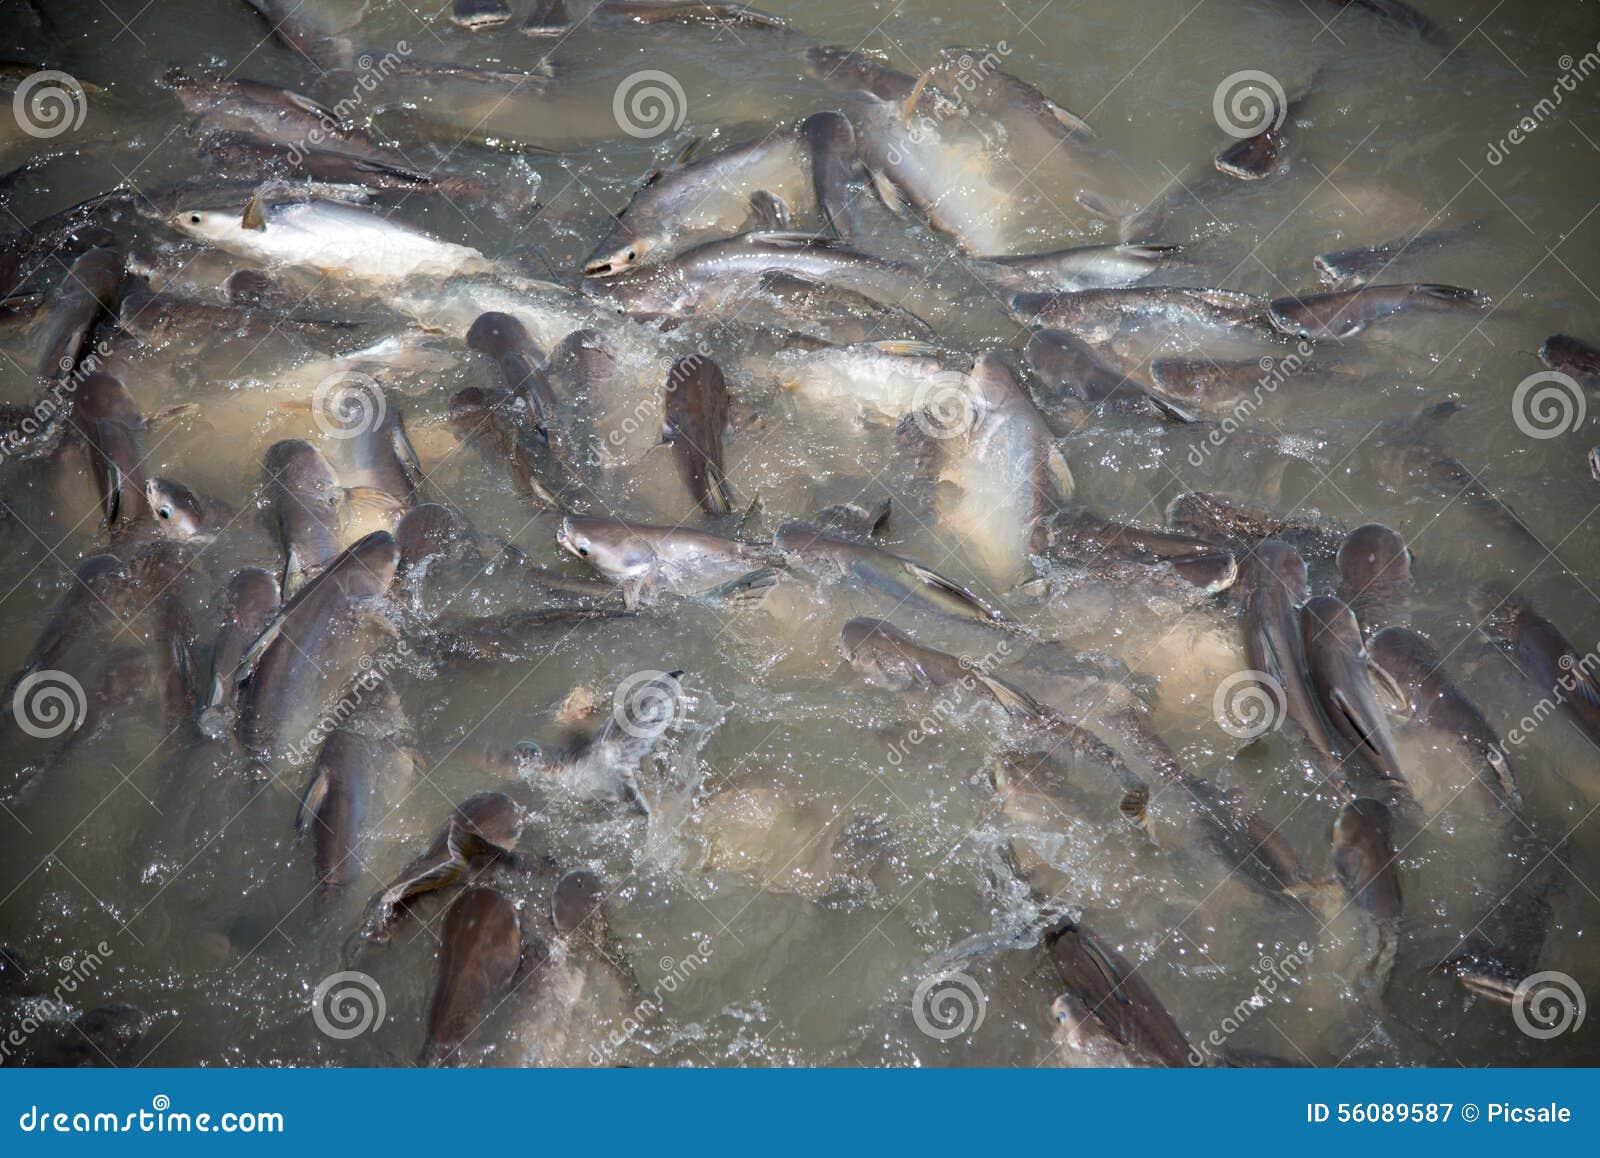 Feeding frenzy of fish stock photo image 56089587 for Feeding frenzy fish